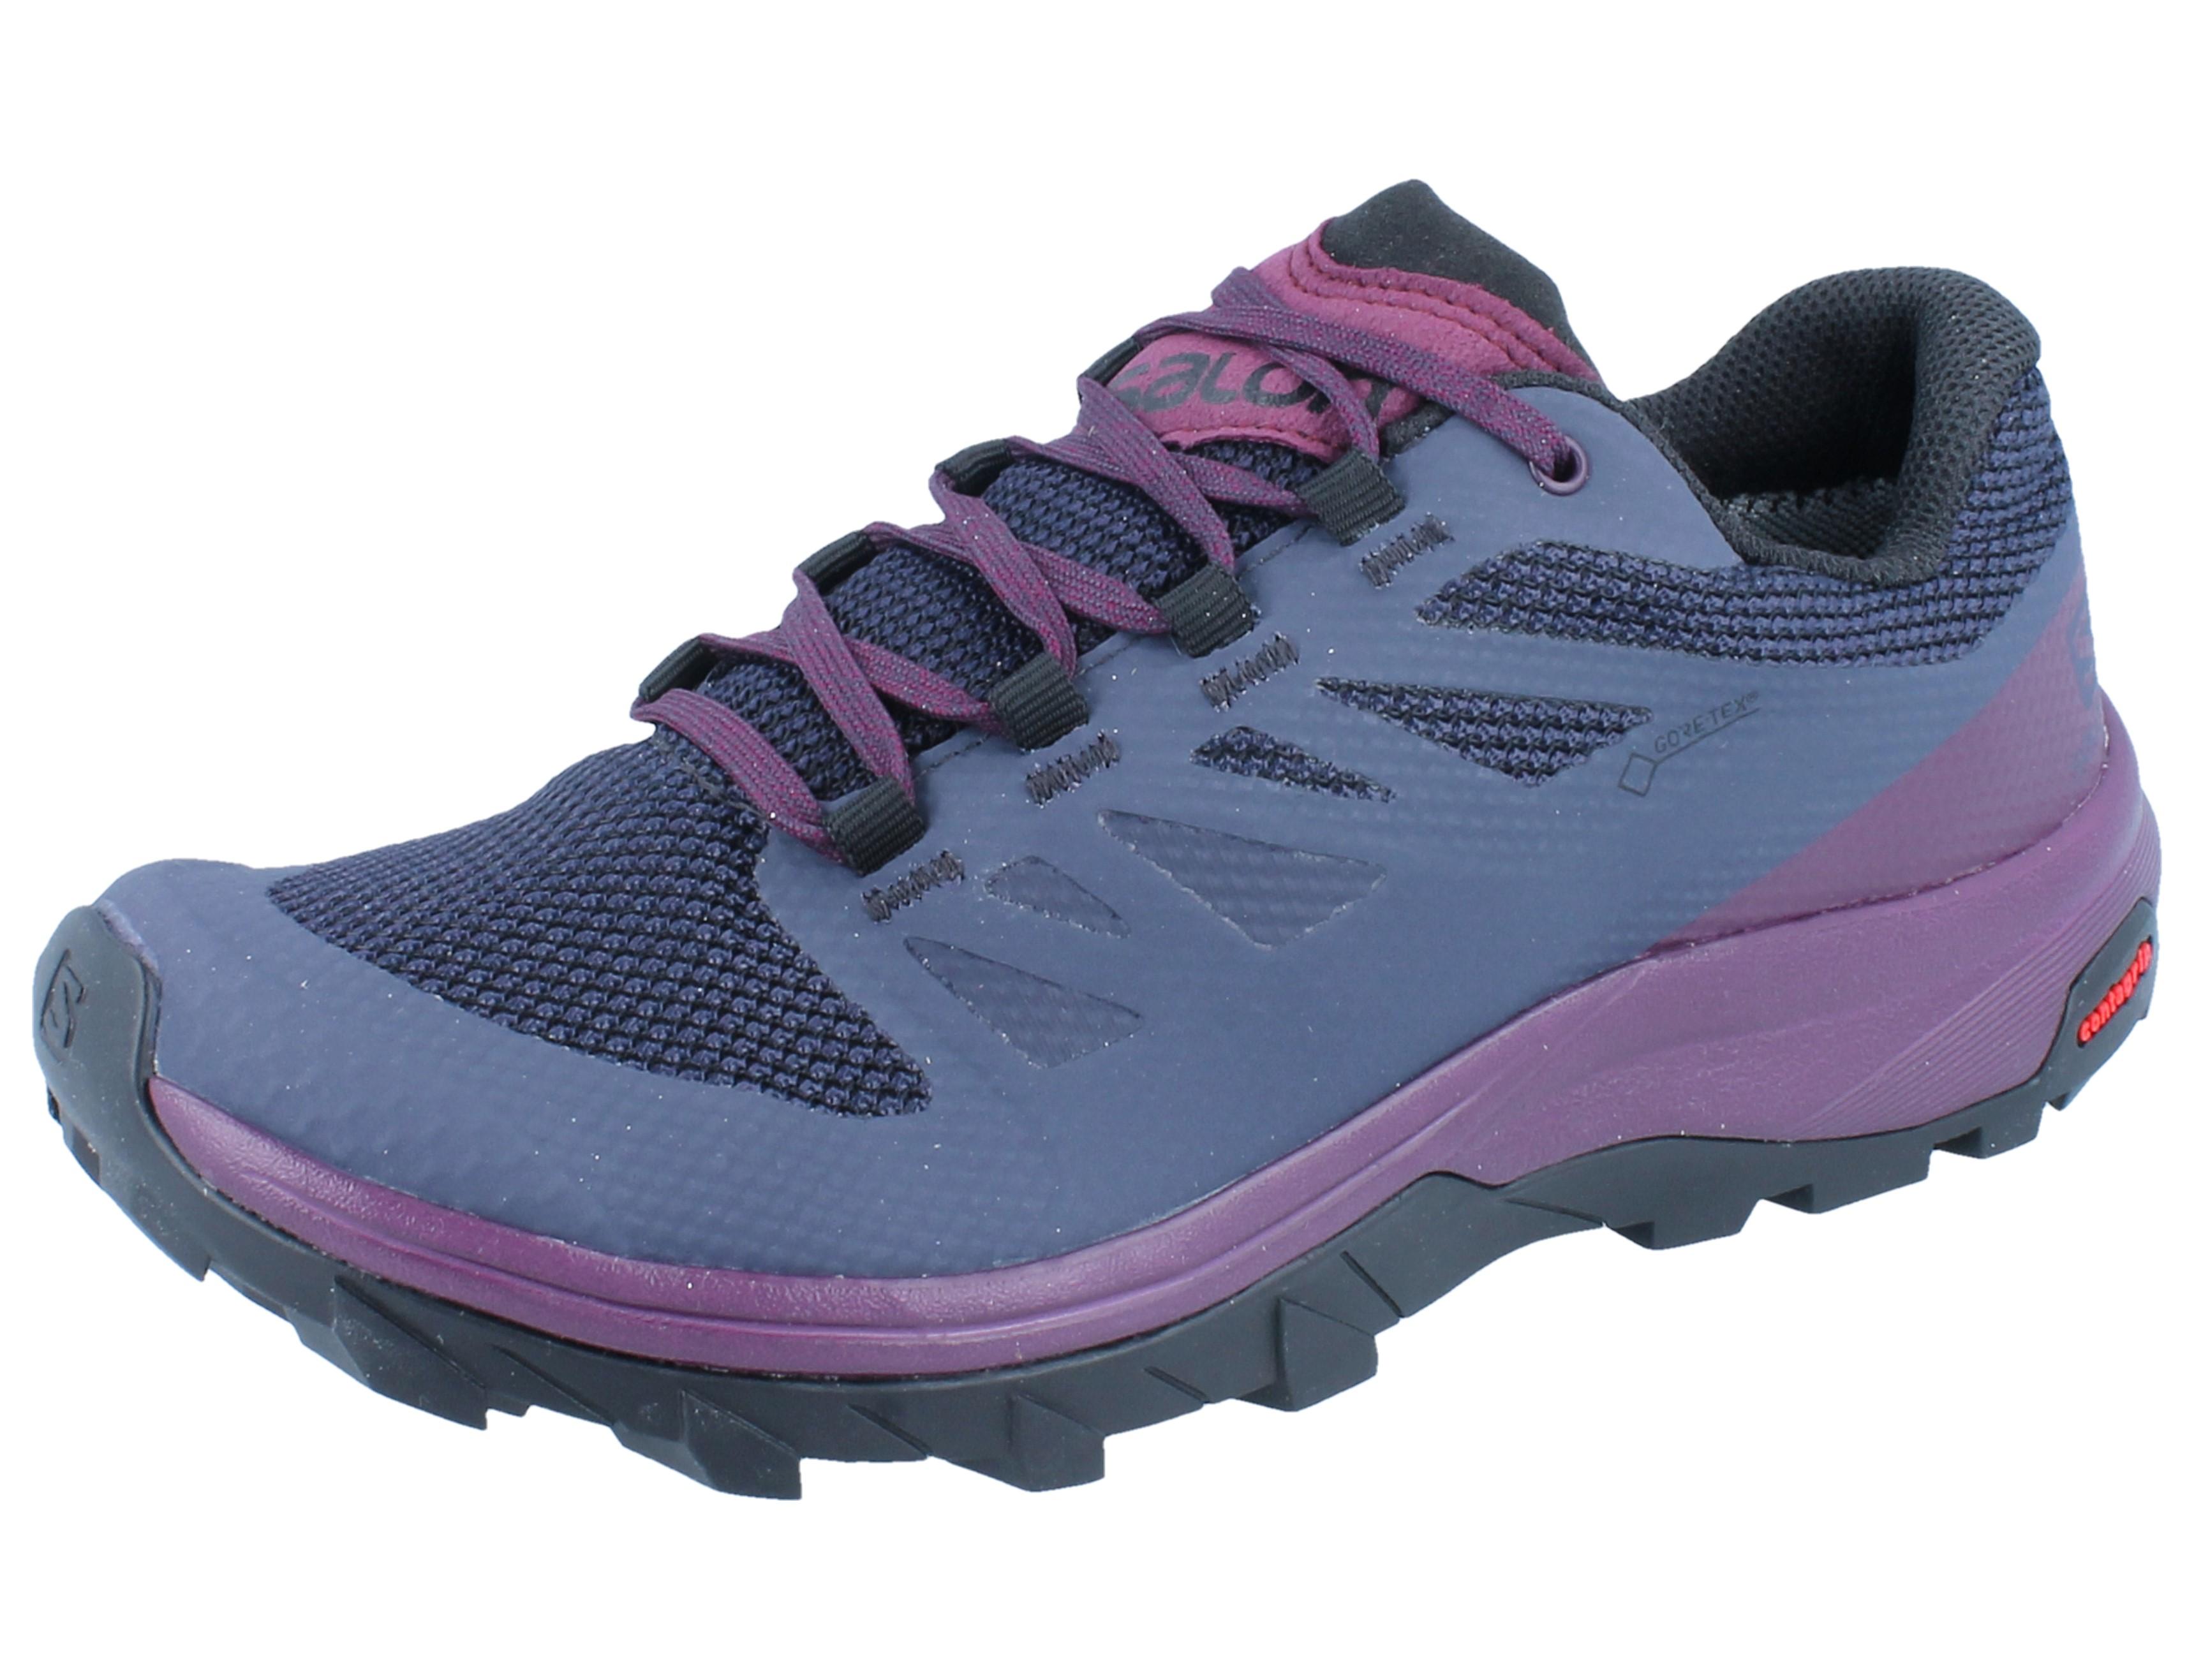 damen Salomon OUTLINE GTX Hikingschuh graphitepotent purple